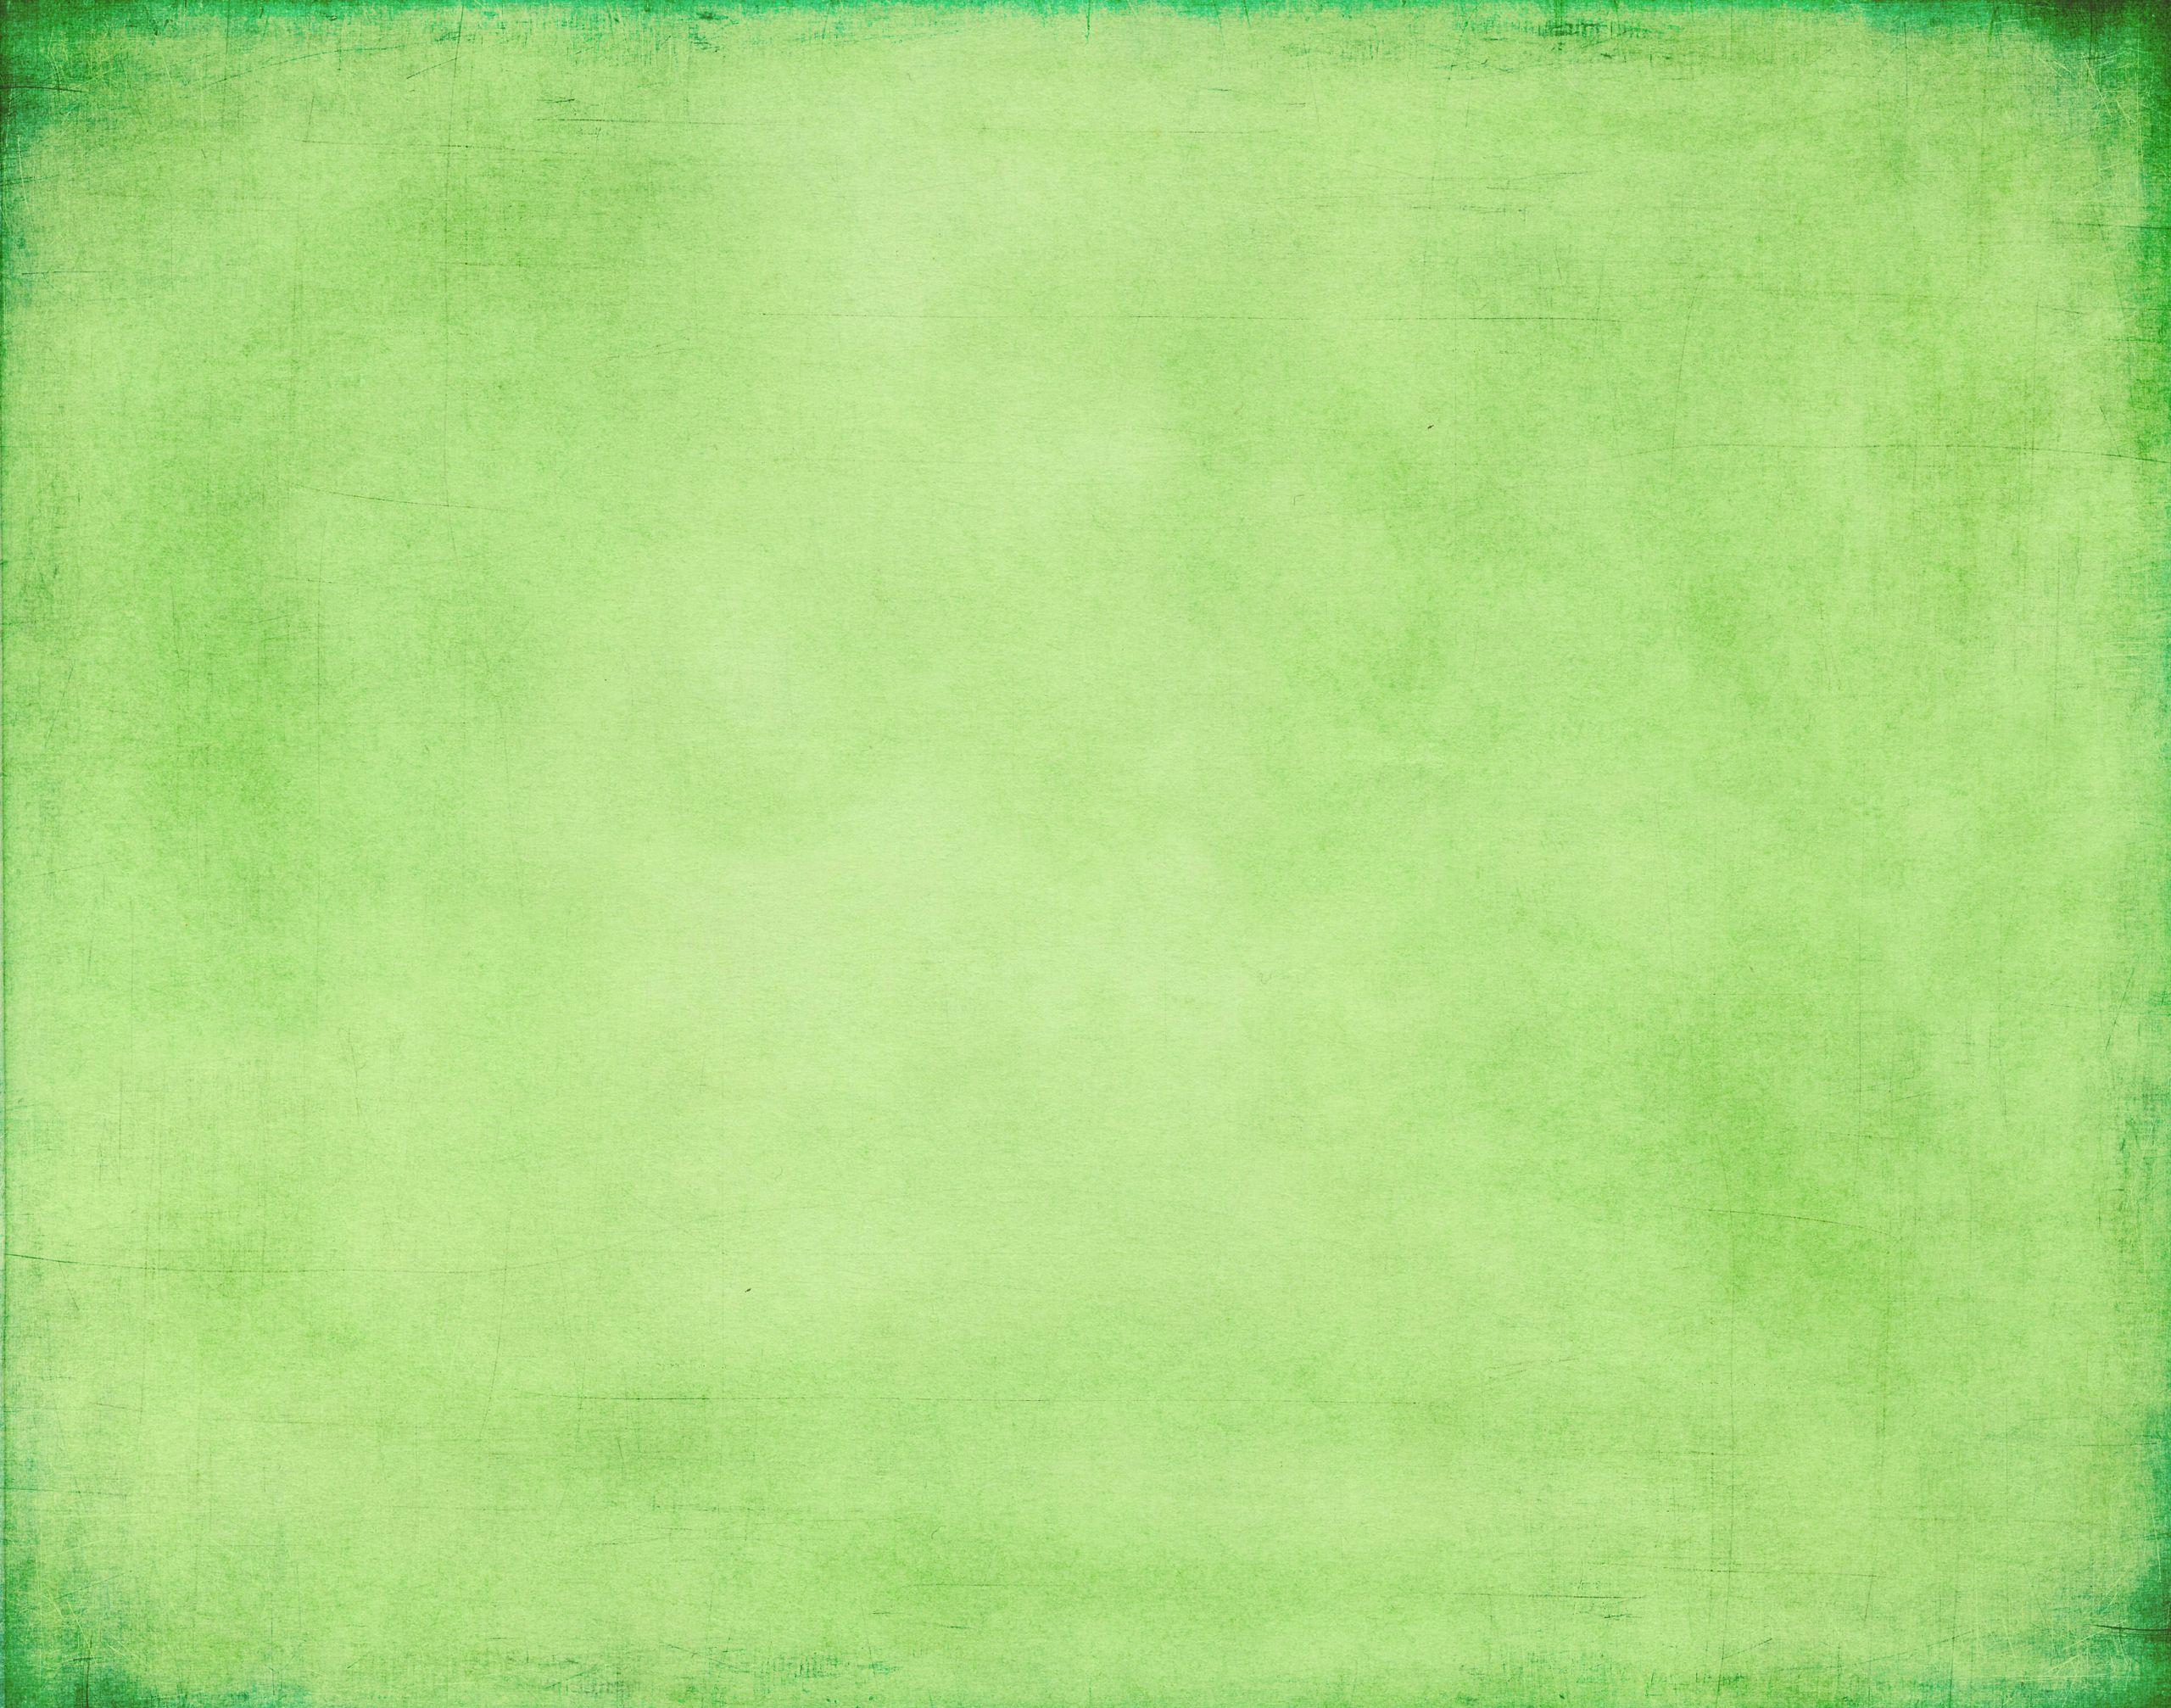 Dark Green Watercolor Background Google Search Watercolor